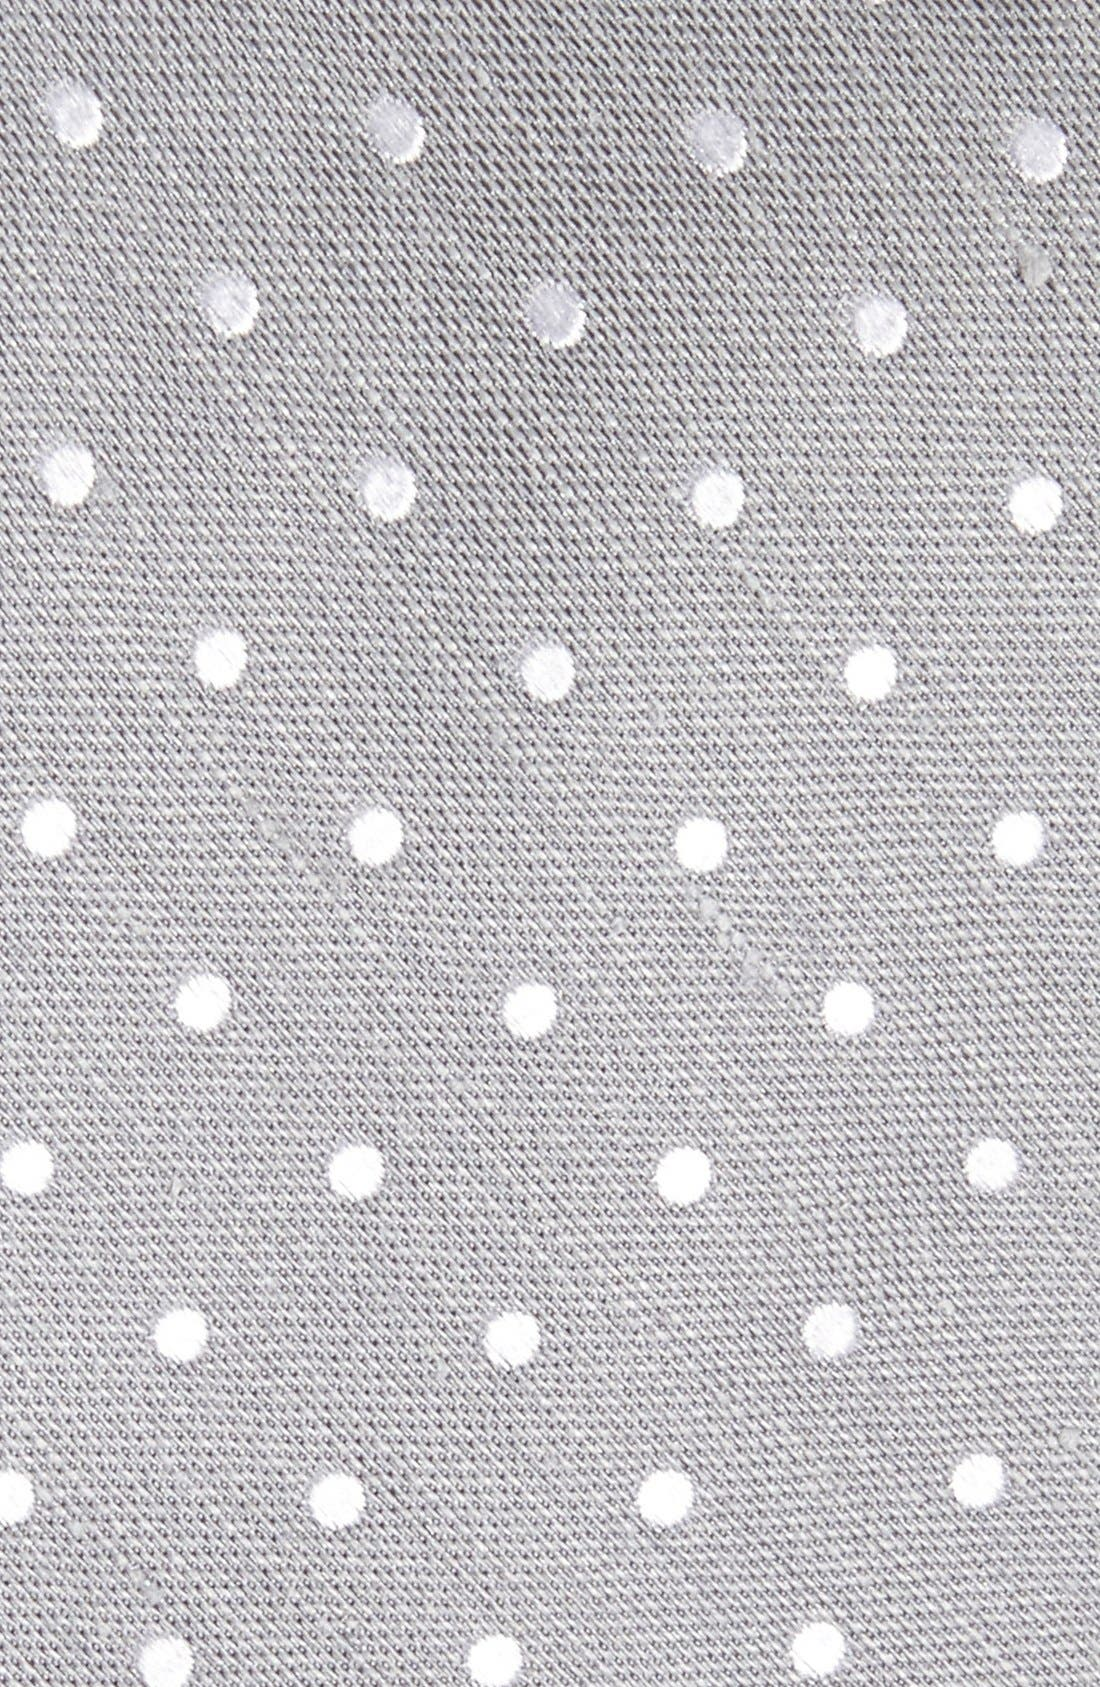 Alternate Image 2  - The Tie Bar Dot Silk & Linen Tie